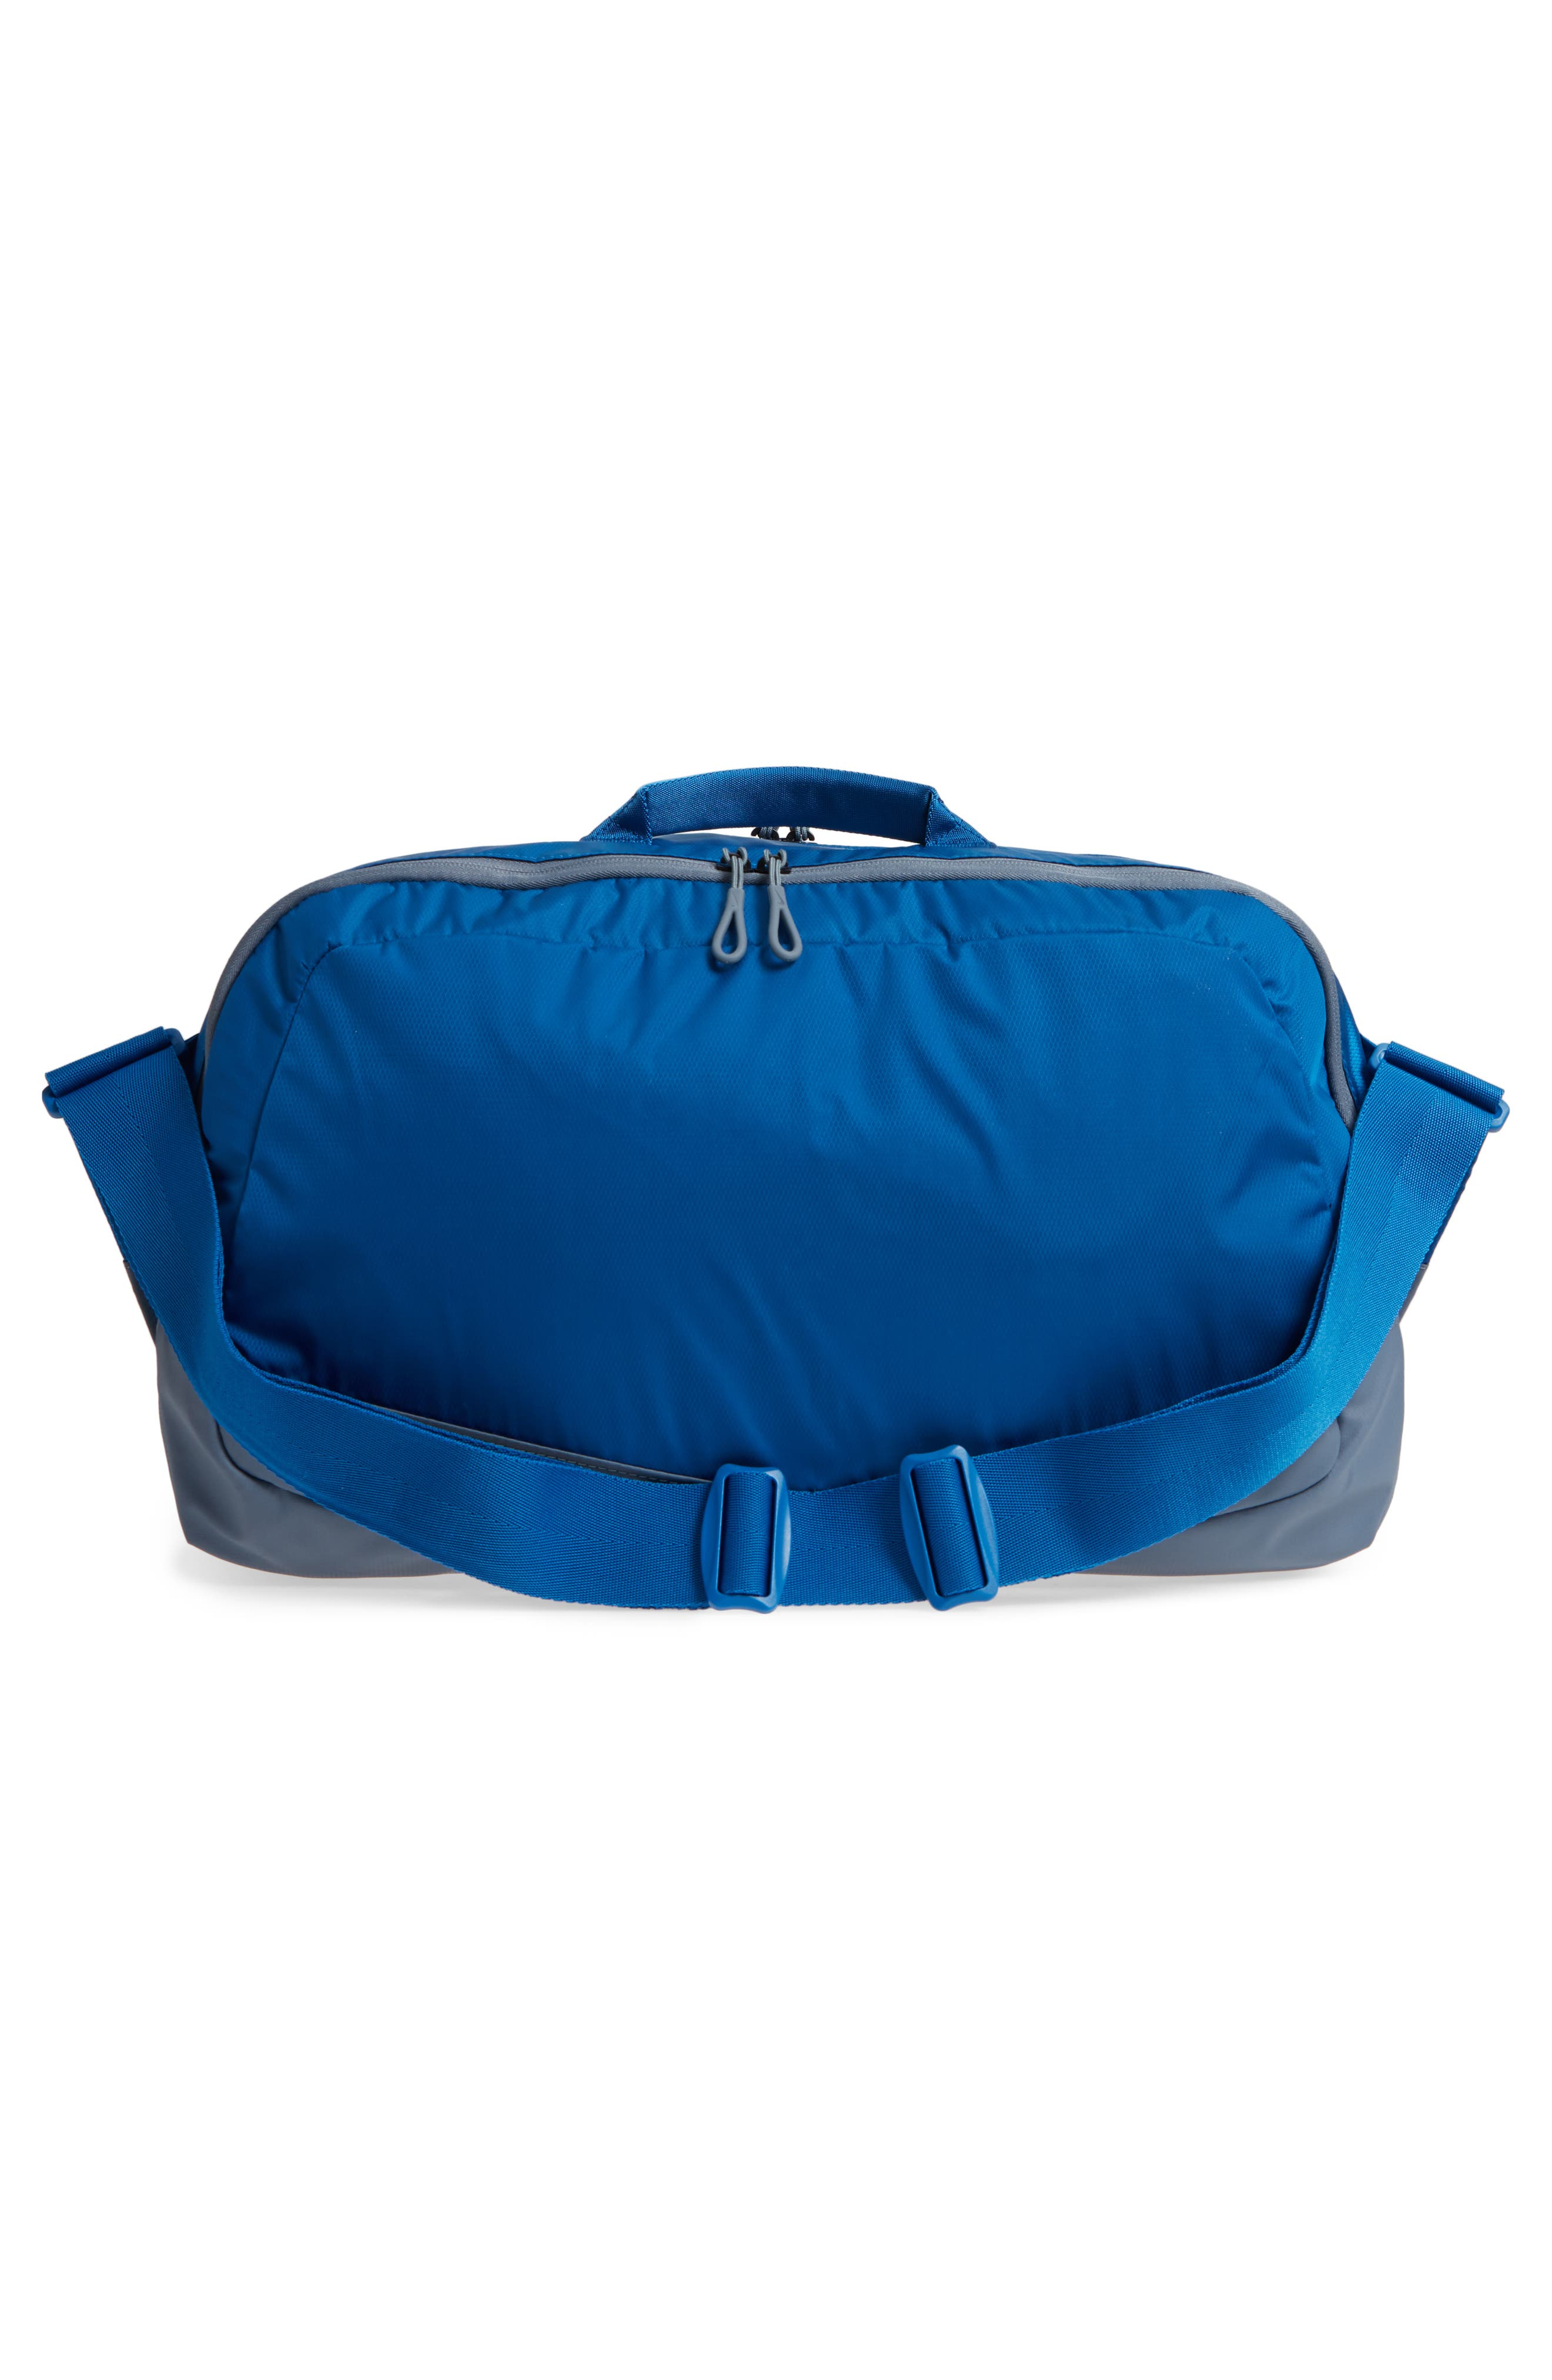 Run Duffel Bag,                             Alternate thumbnail 3, color,                             Blue Jay/ Armory Blue/ Silver